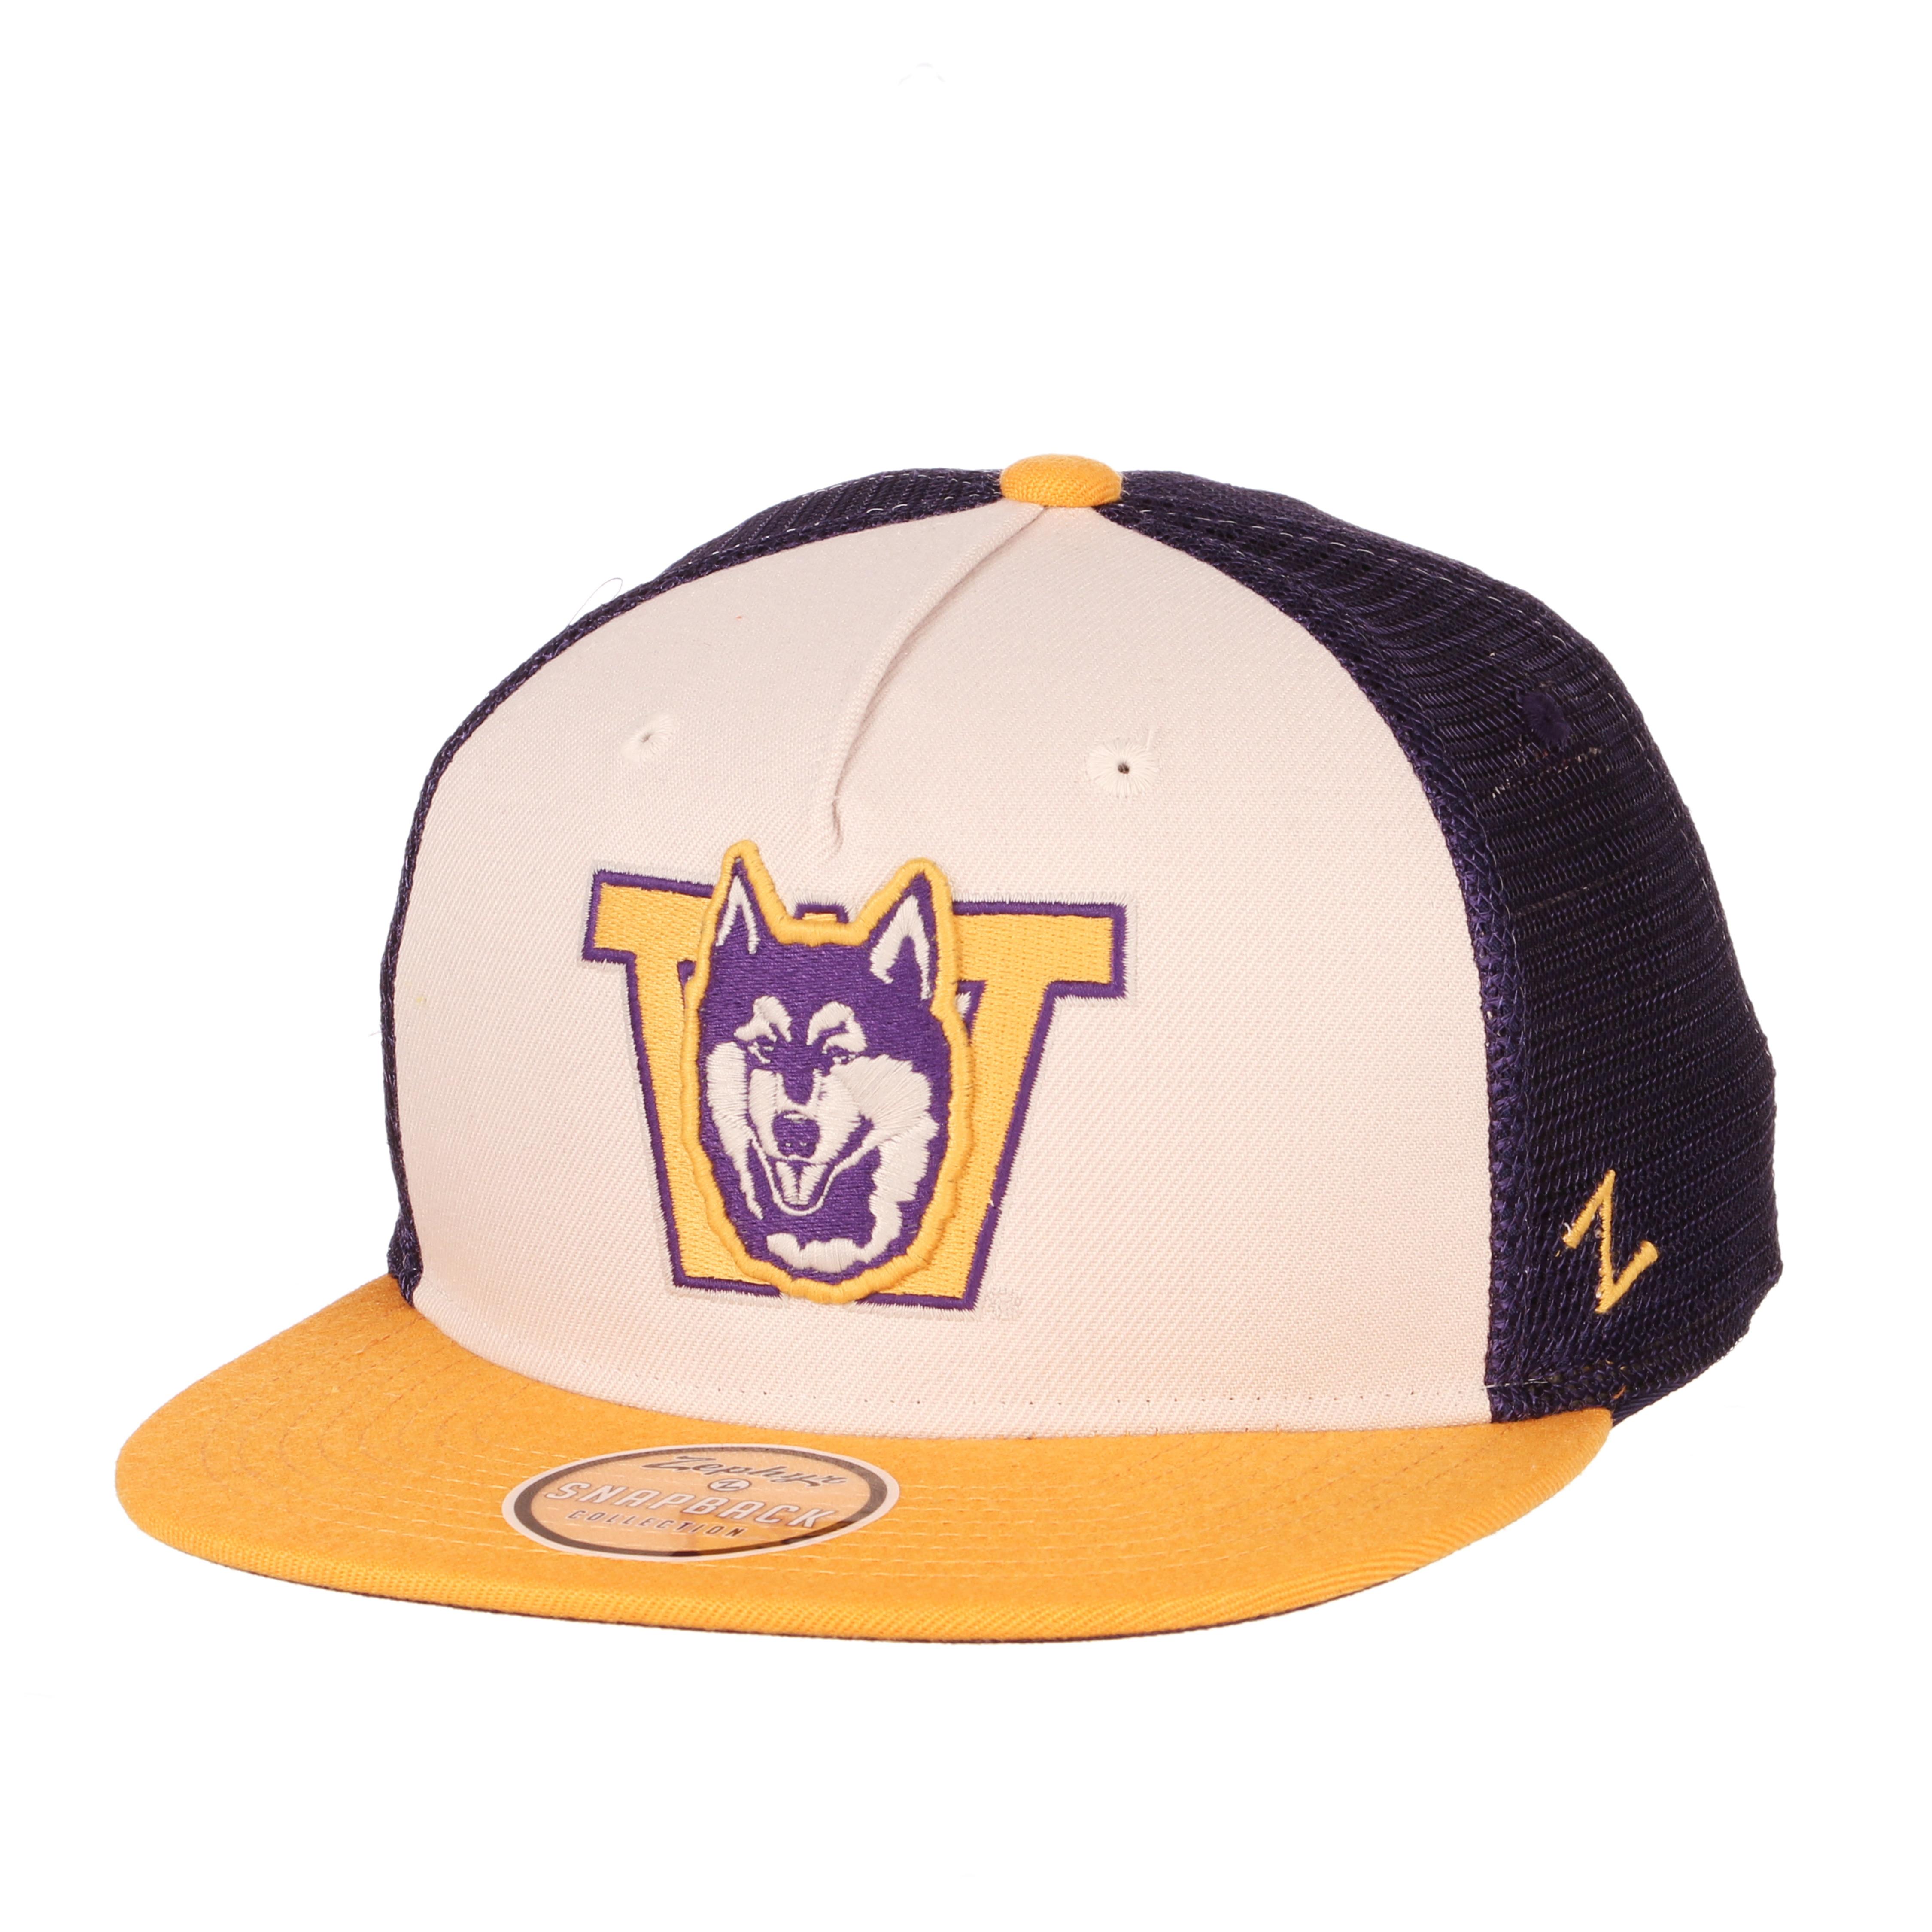 Washington Huskies Zephyr Paradigm Adjustable Cap Hat